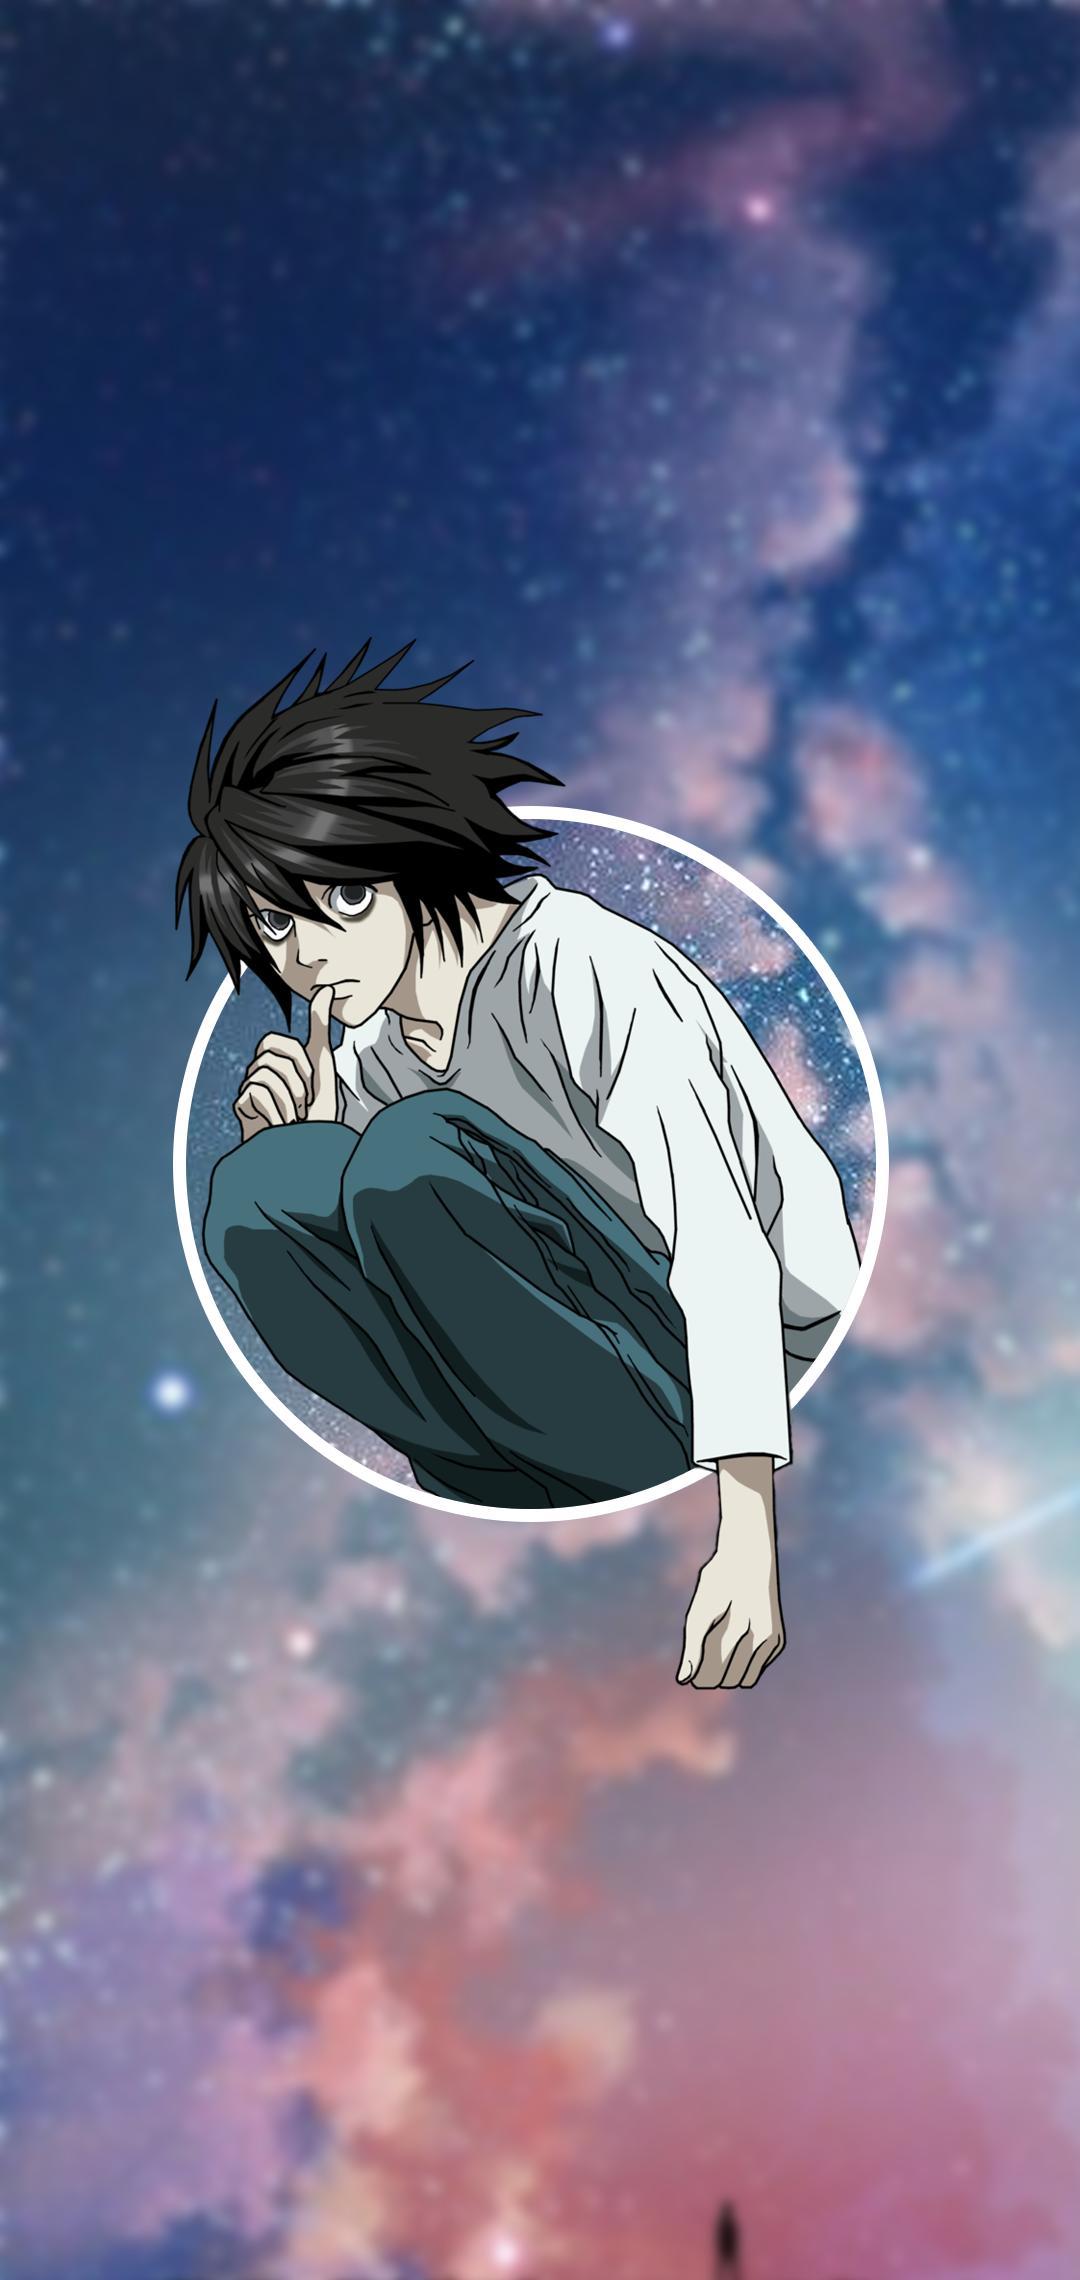 Wallpaper Anime Phone 1080x2280 Gropanda 1610617 Hd Wallpapers Wallhere